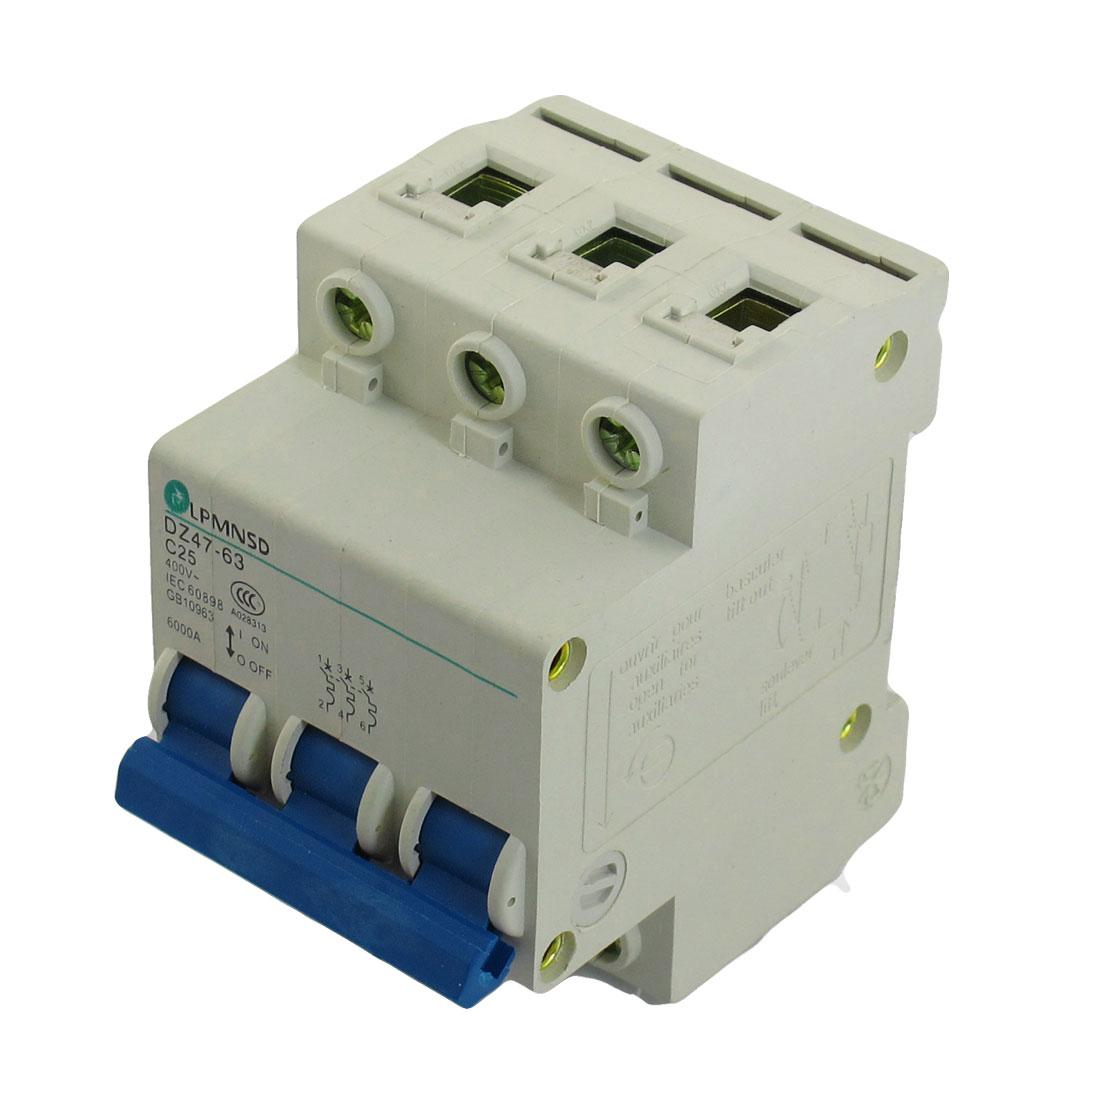 DZ47-63 C25 25A 400VAC 6000A Breaking Capacity 3 Poles Circuit Breaker